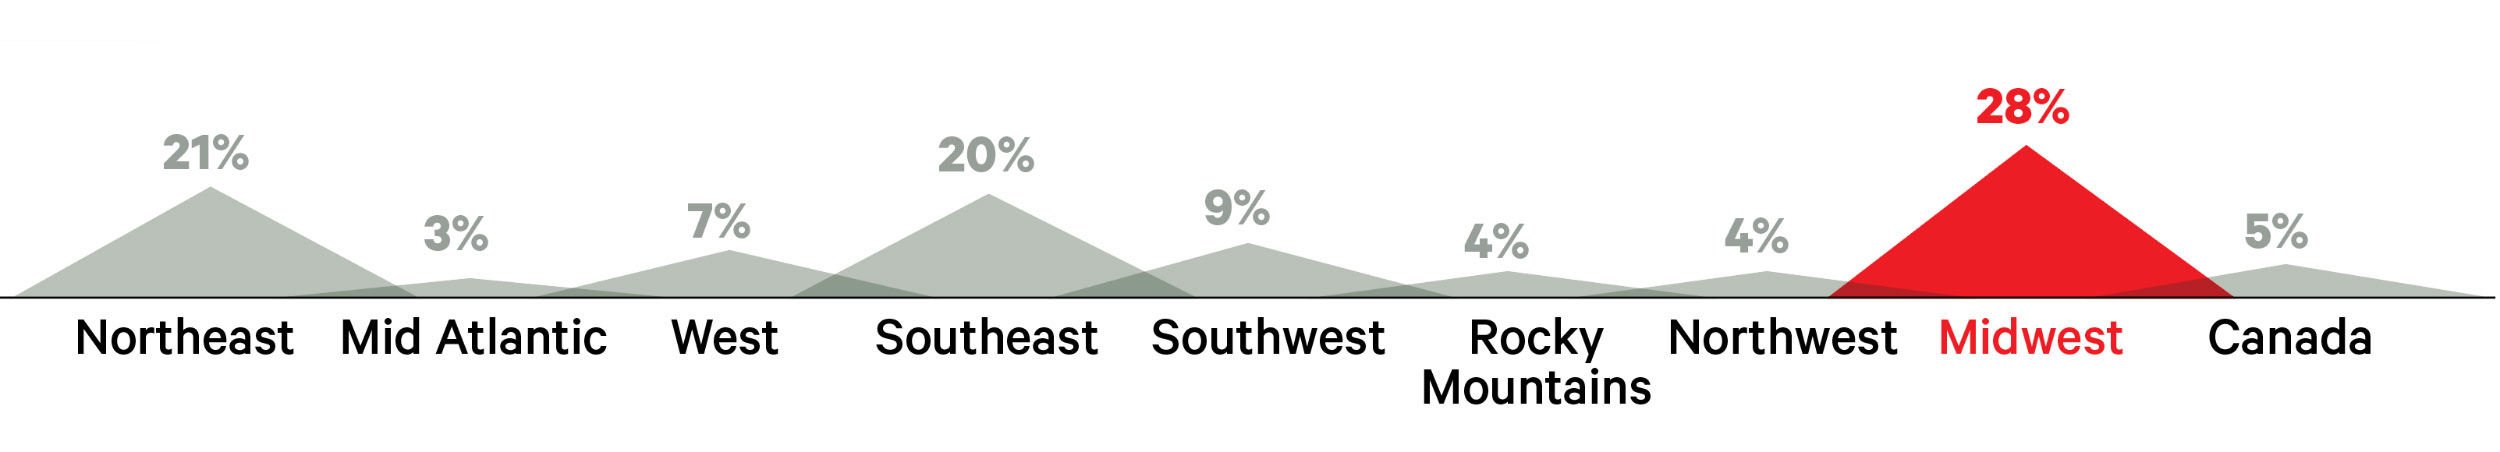 big survey 2020 -store locations by region